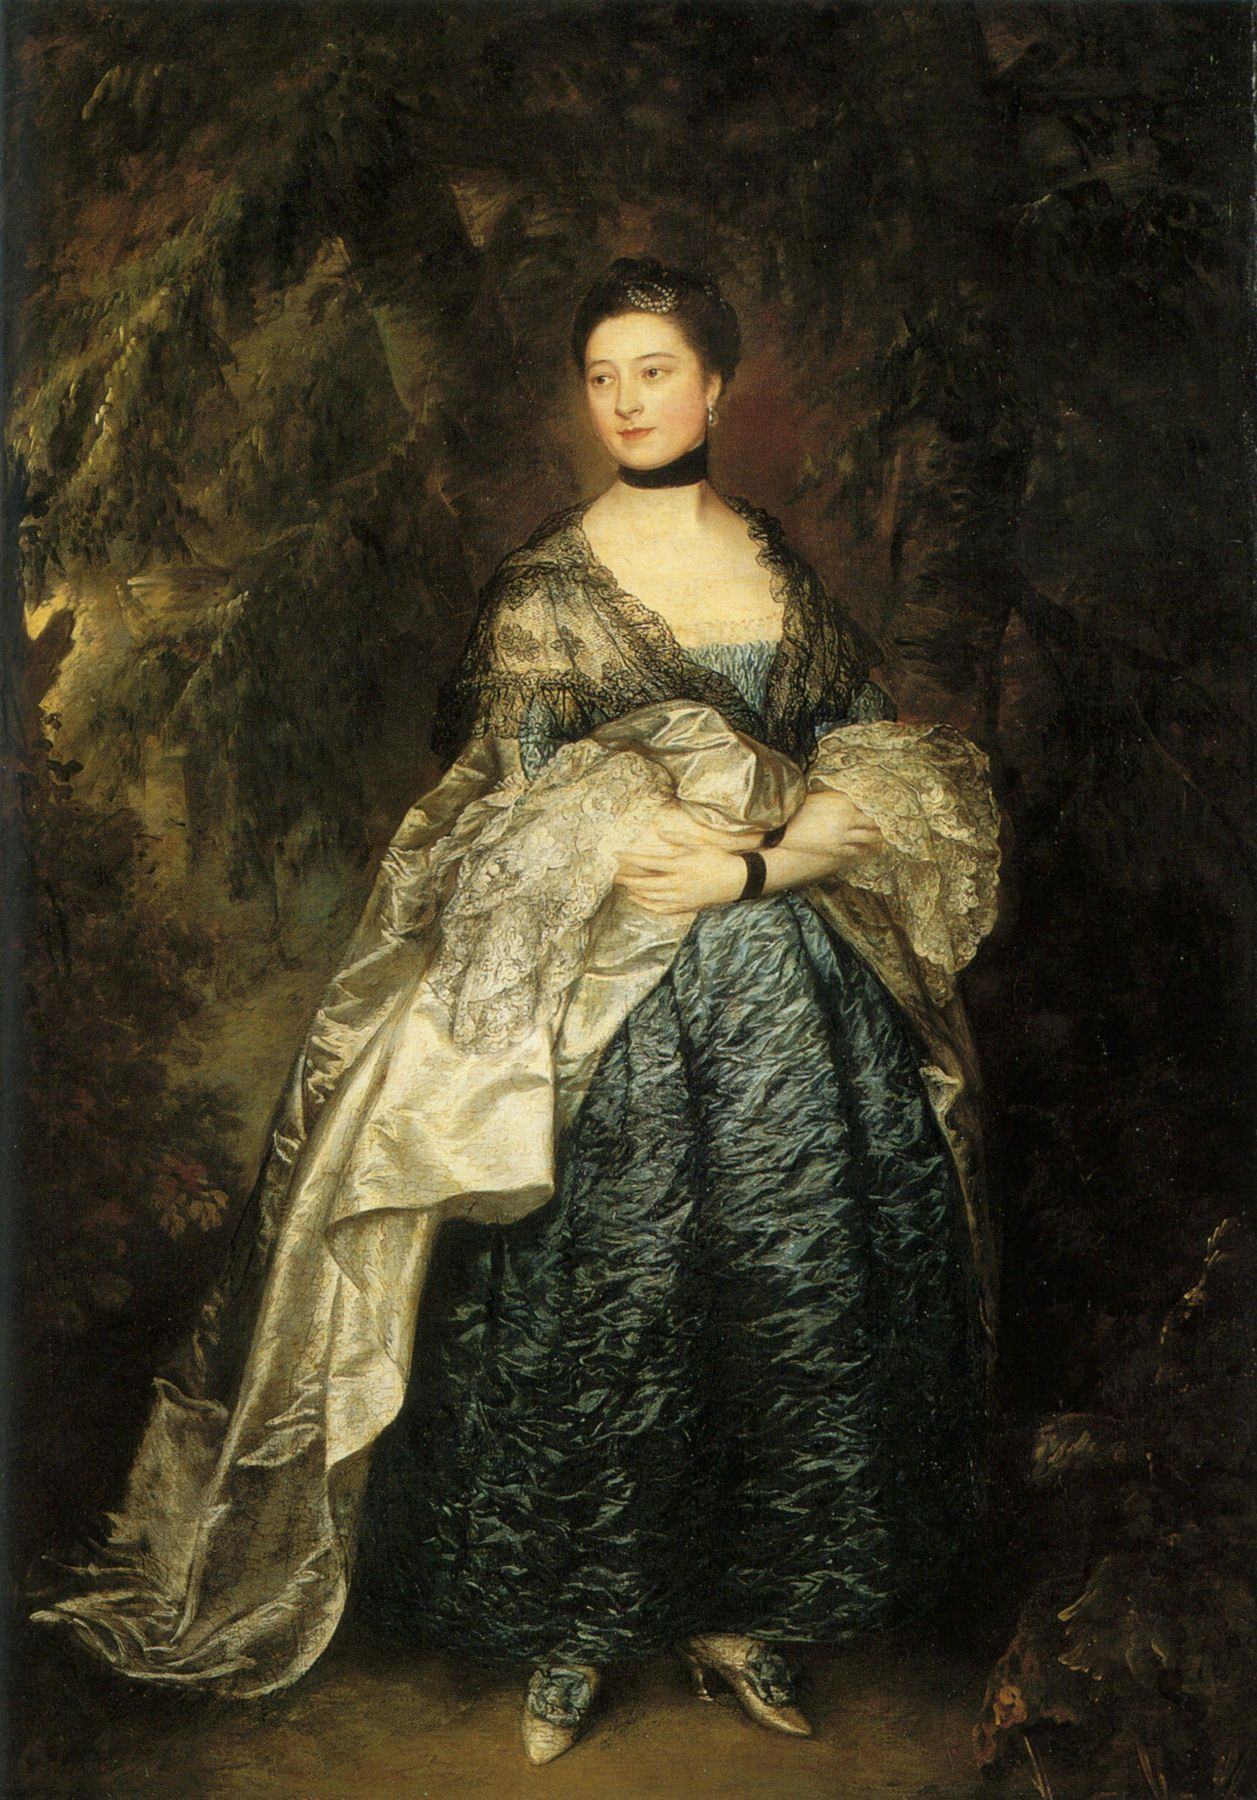 PaintingDb® | Gainsborough, Thomas | Lady Alston paintingdb.com1257 × 1800Buscar por imagen Gainsborough, Thomas | Lady Alston  Francis Luis Mora (1874-1940) - Buscar con Google